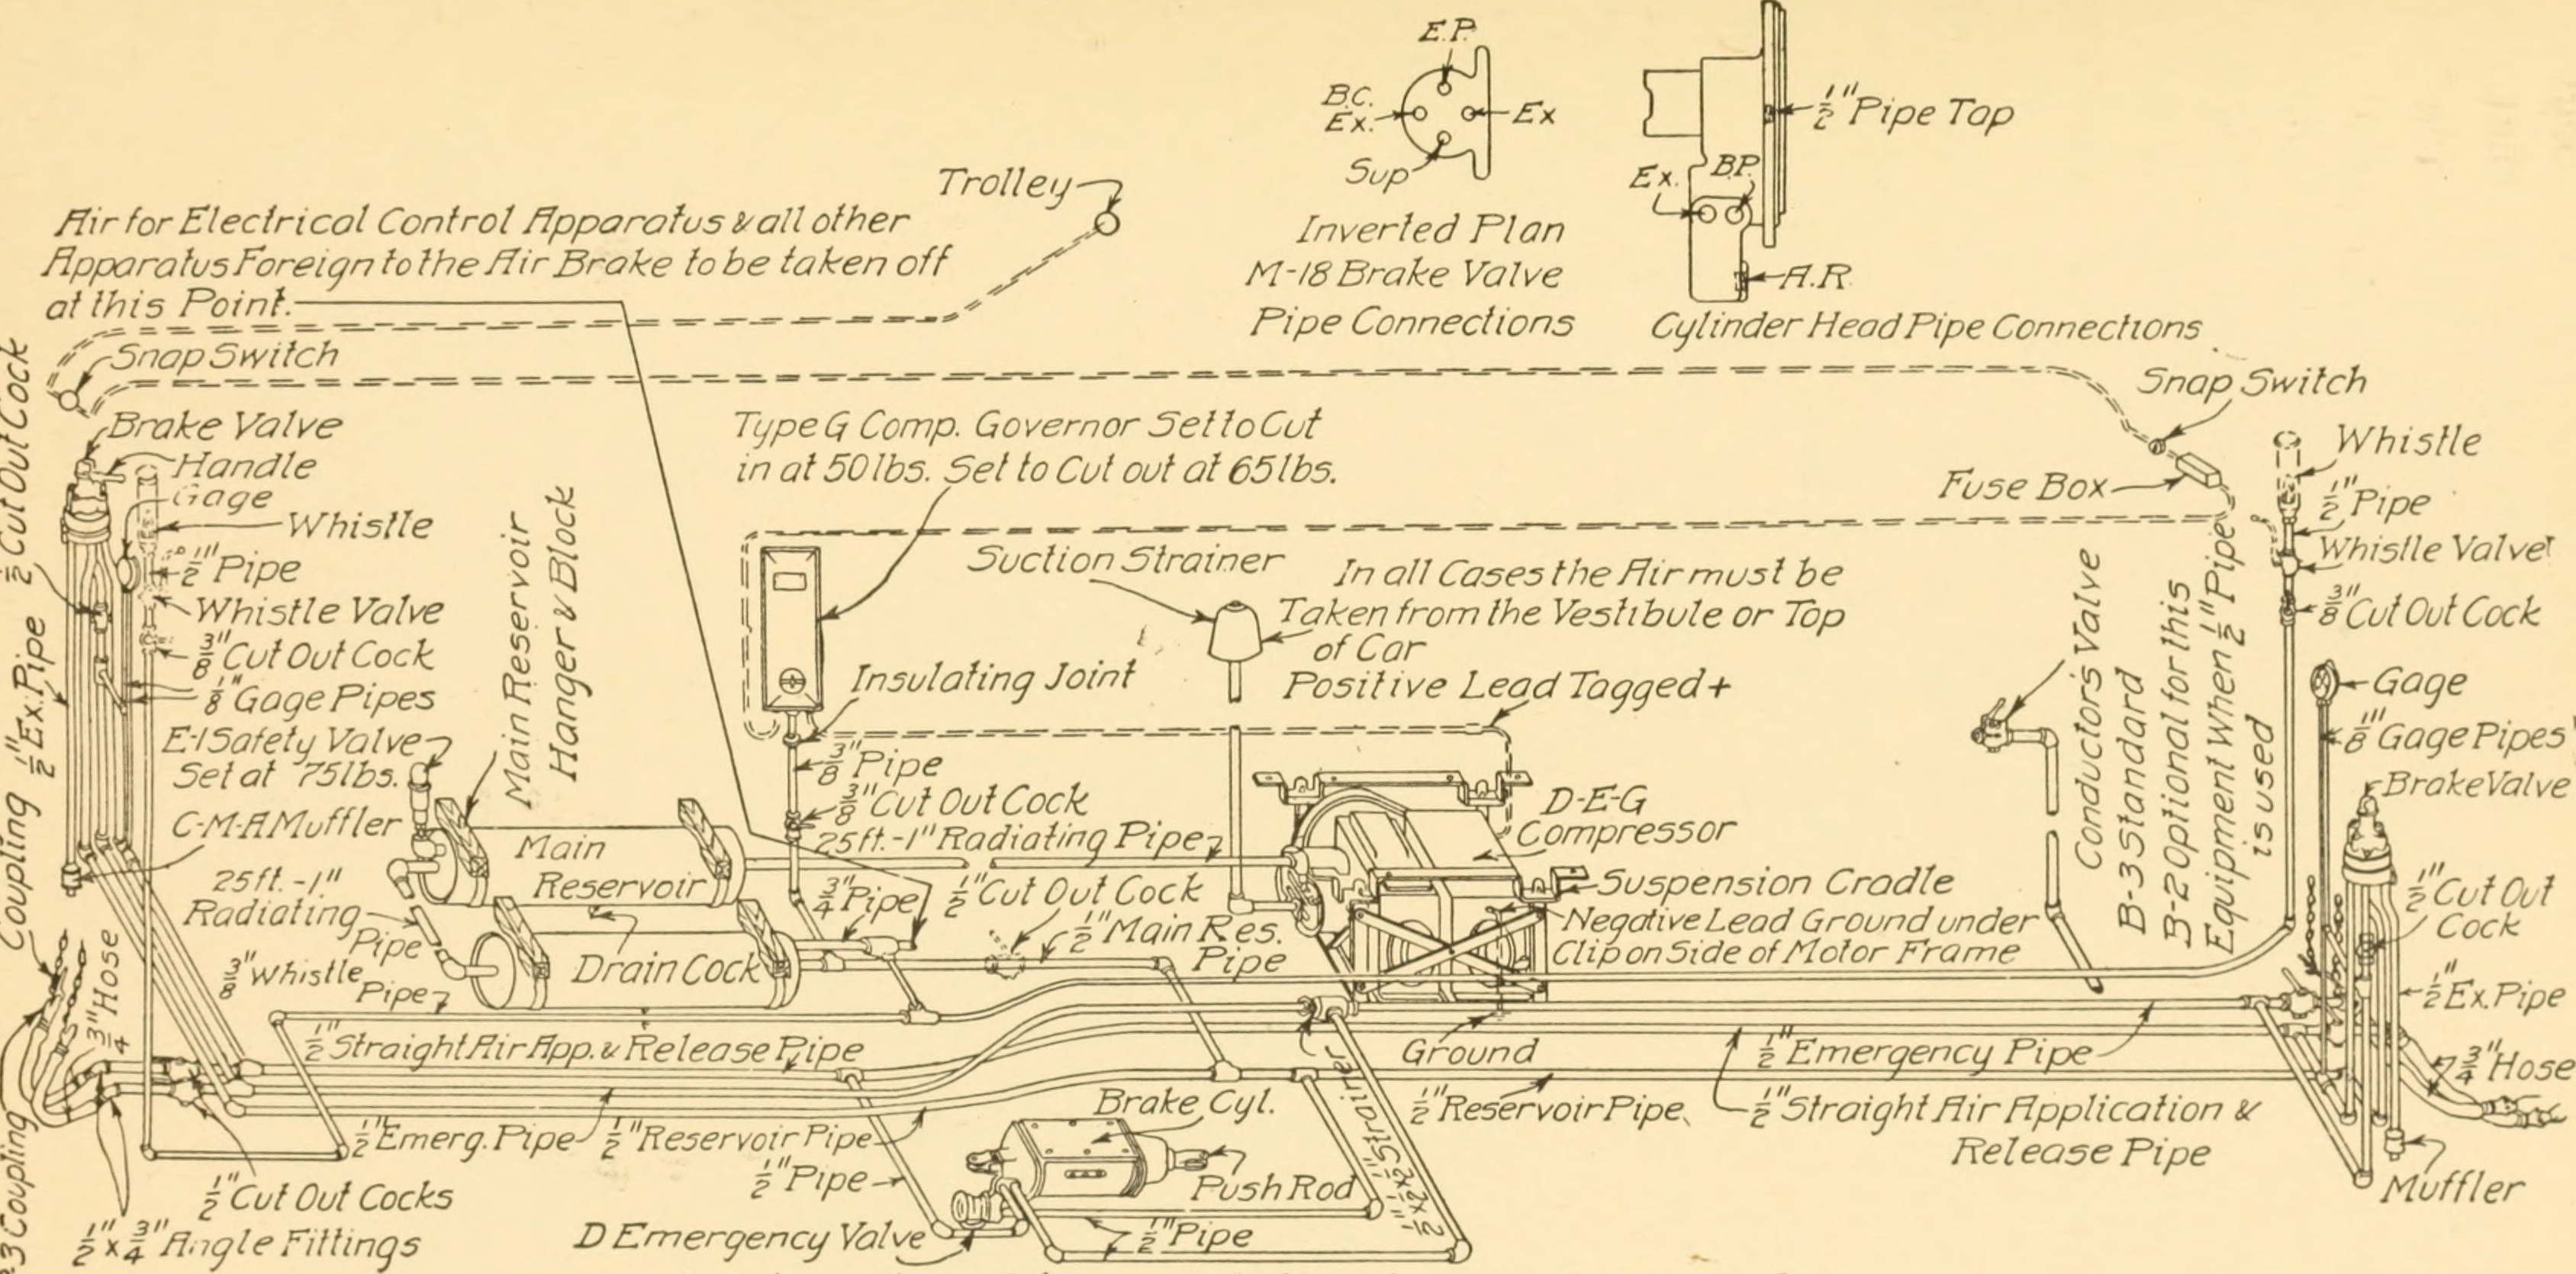 wabco air suspension wiring diagram cat5 bundeswehr free image